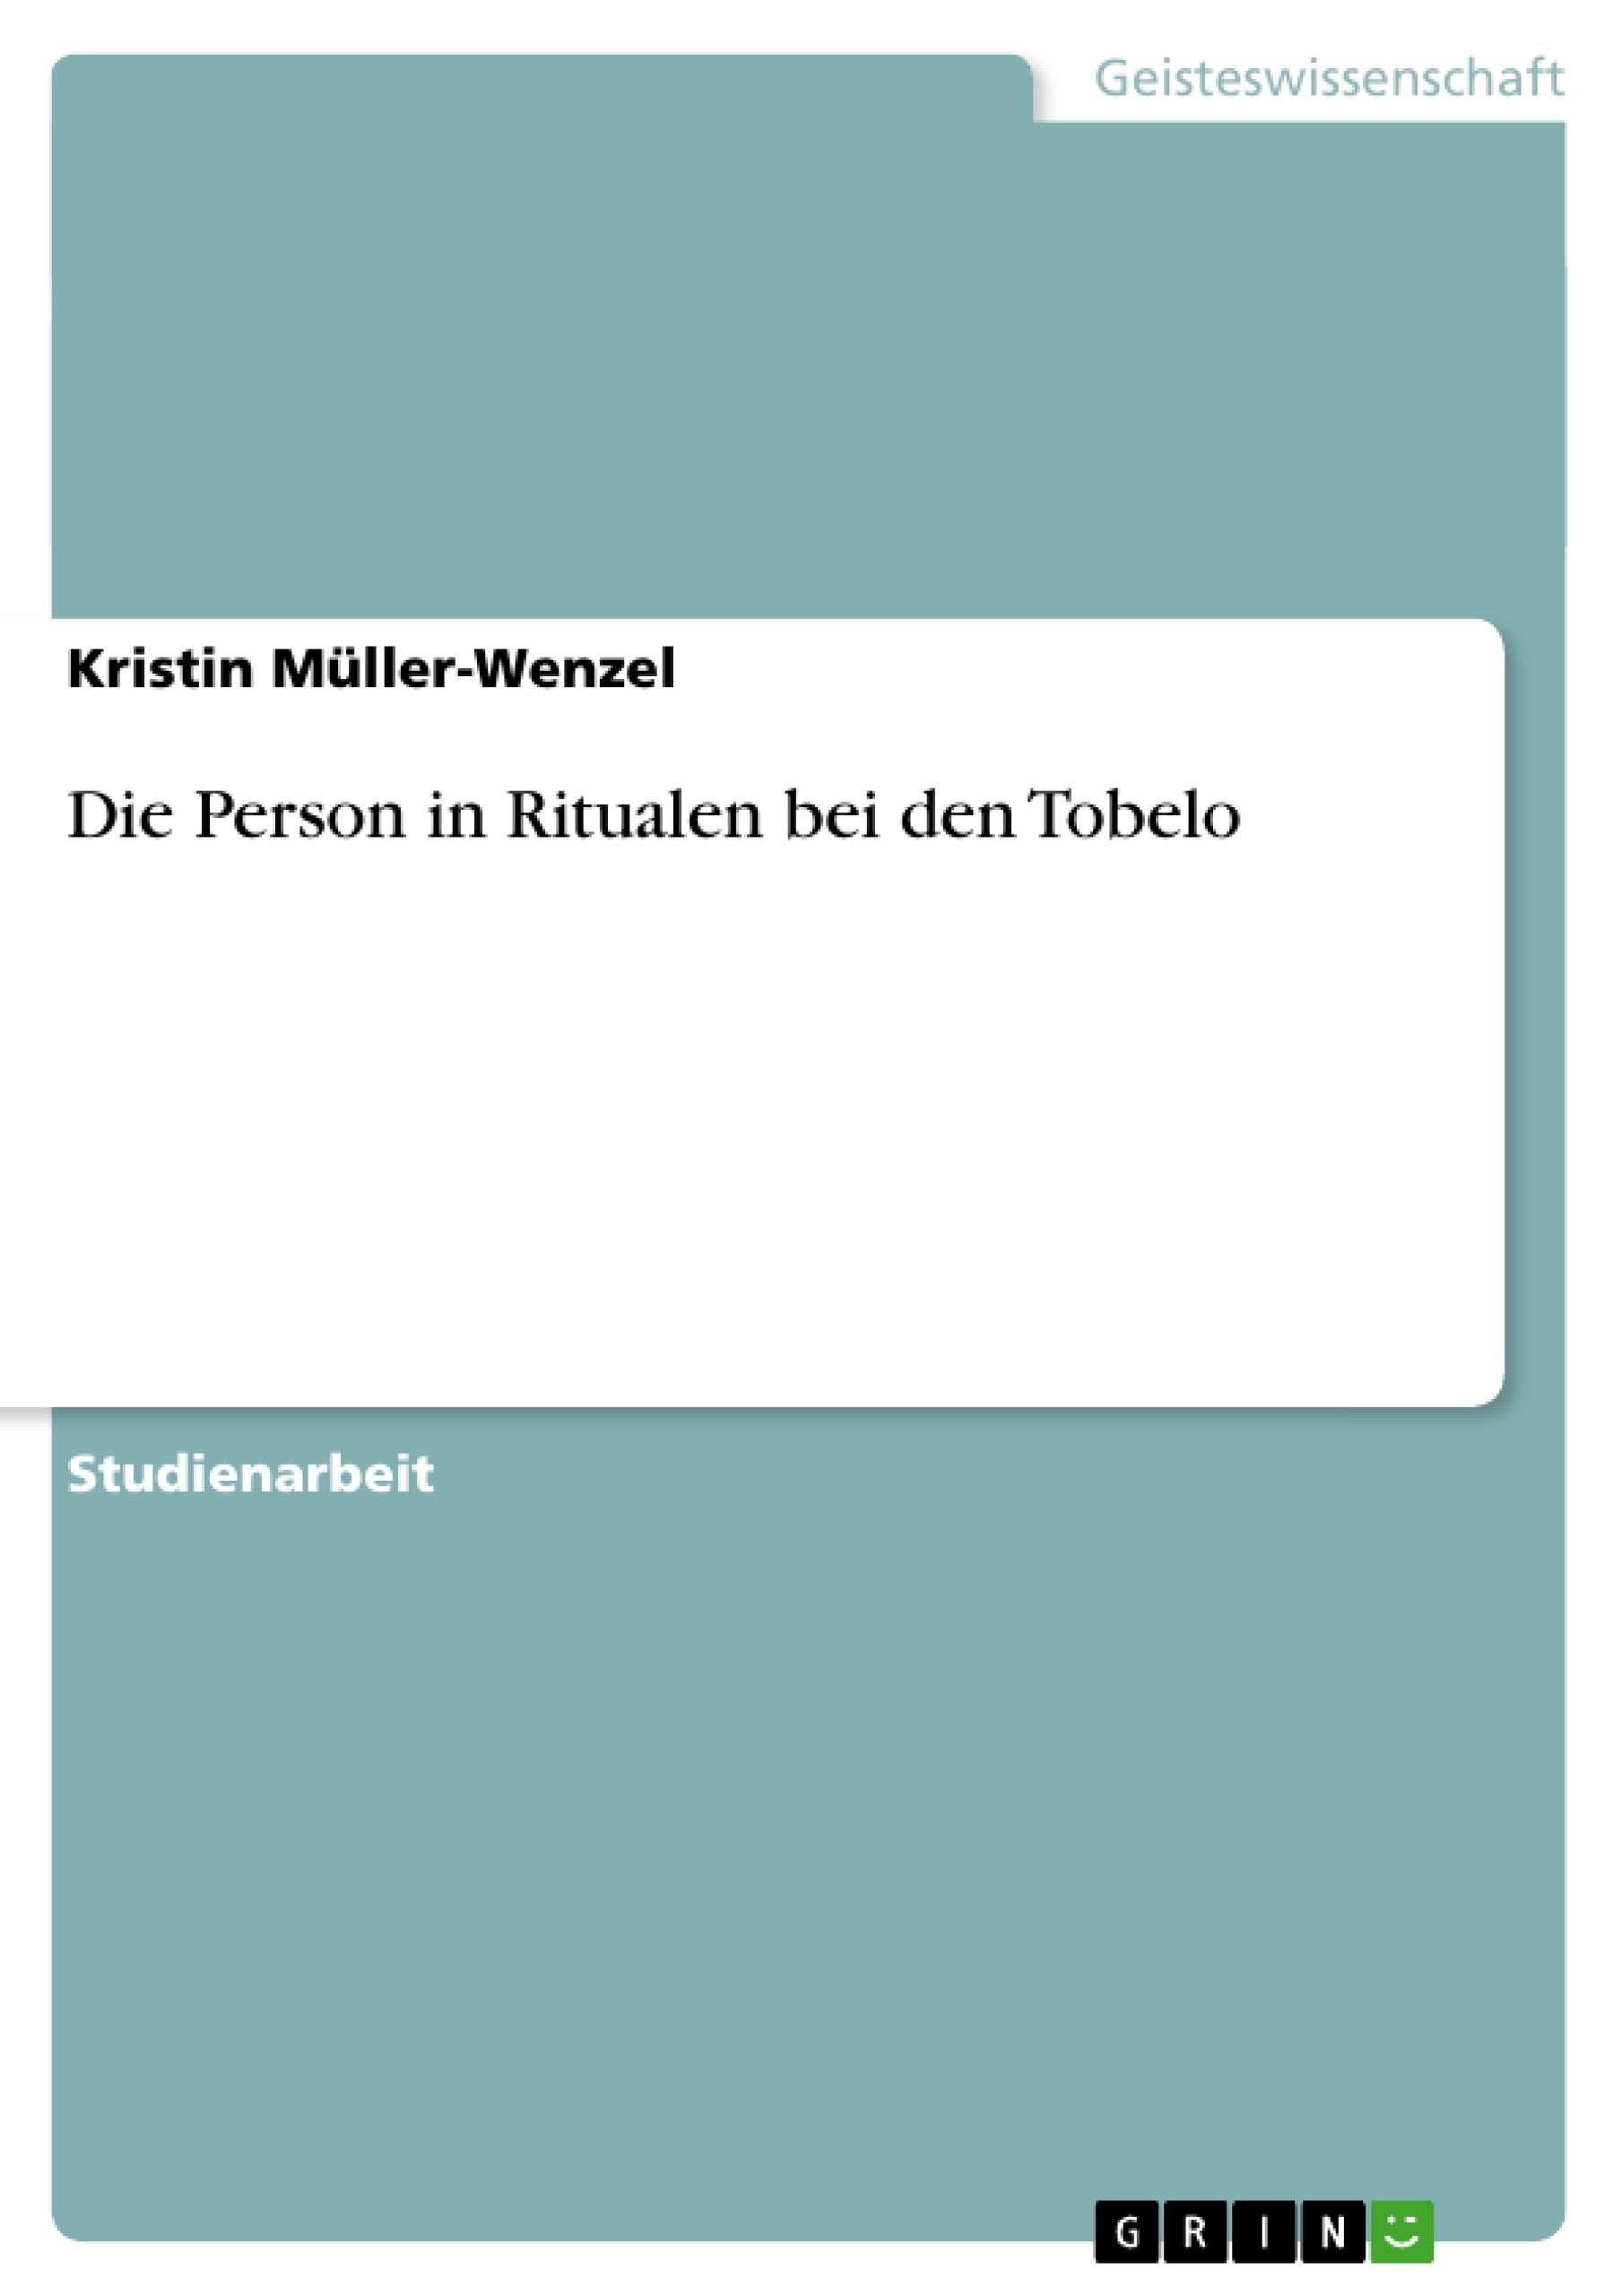 Titel: Die Person in Ritualen bei den Tobelo